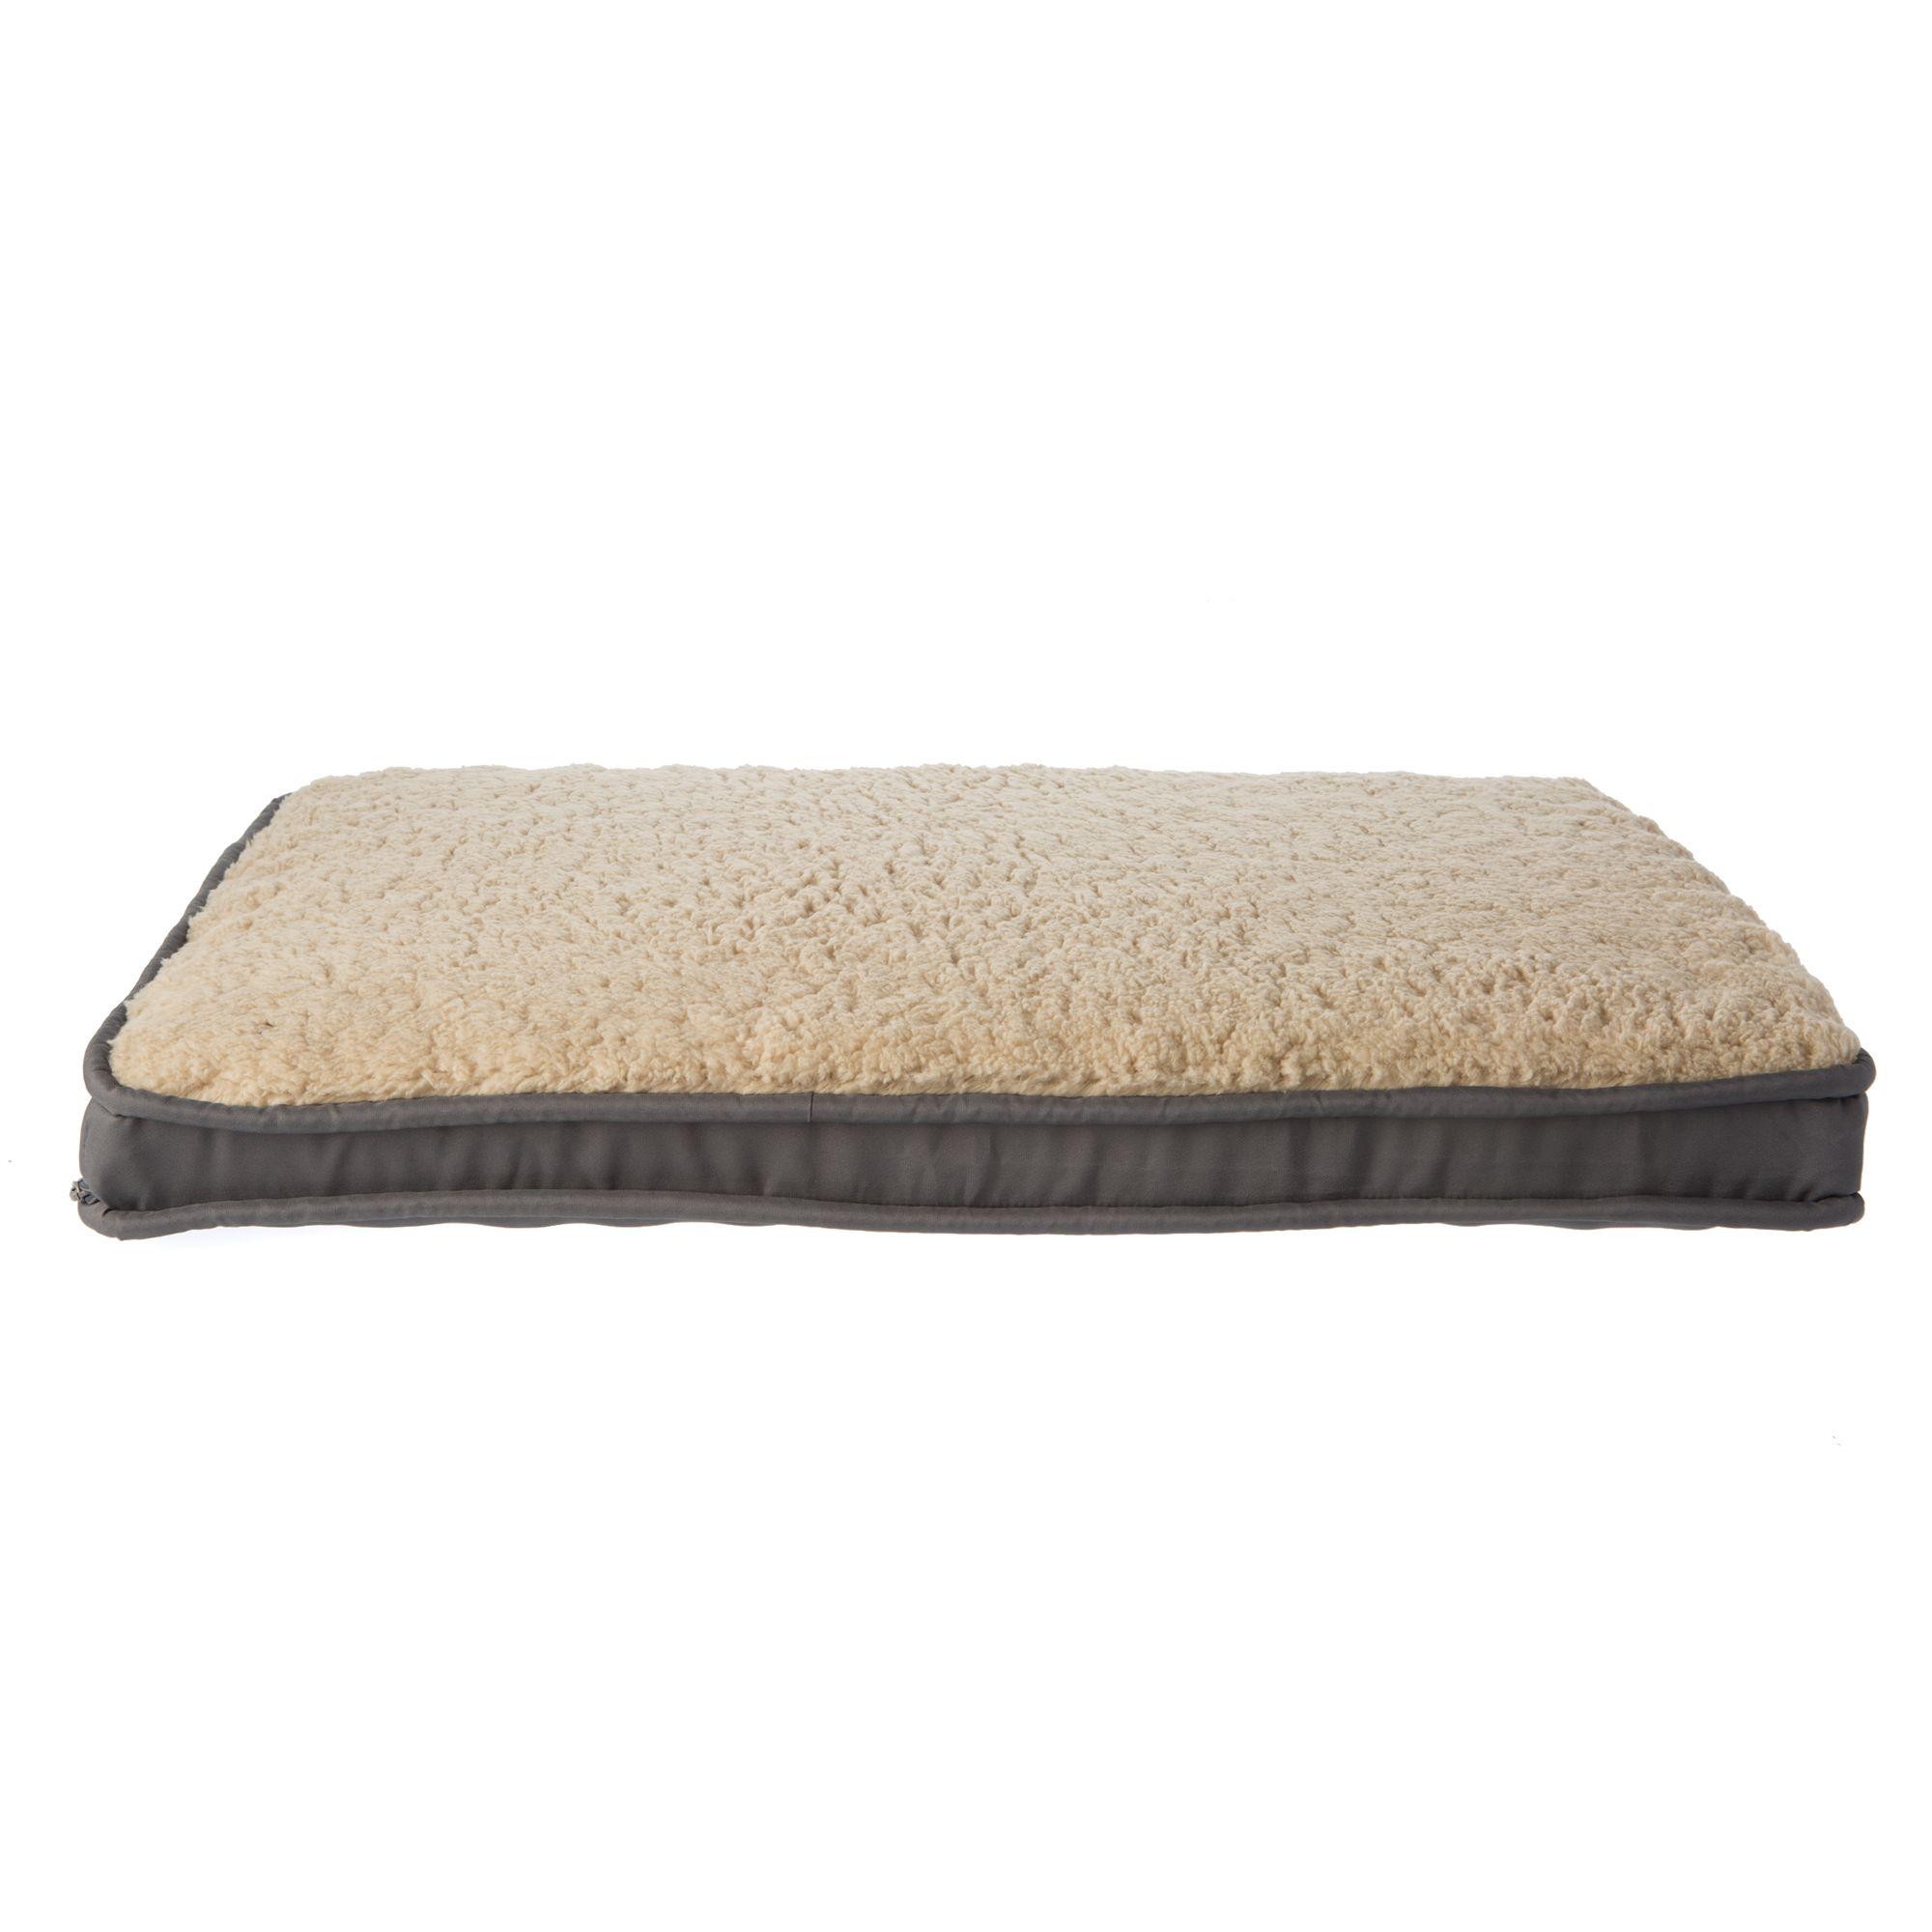 "Top Paw Orthopedic Mattress Pet Bed size 36""L x 48""W"